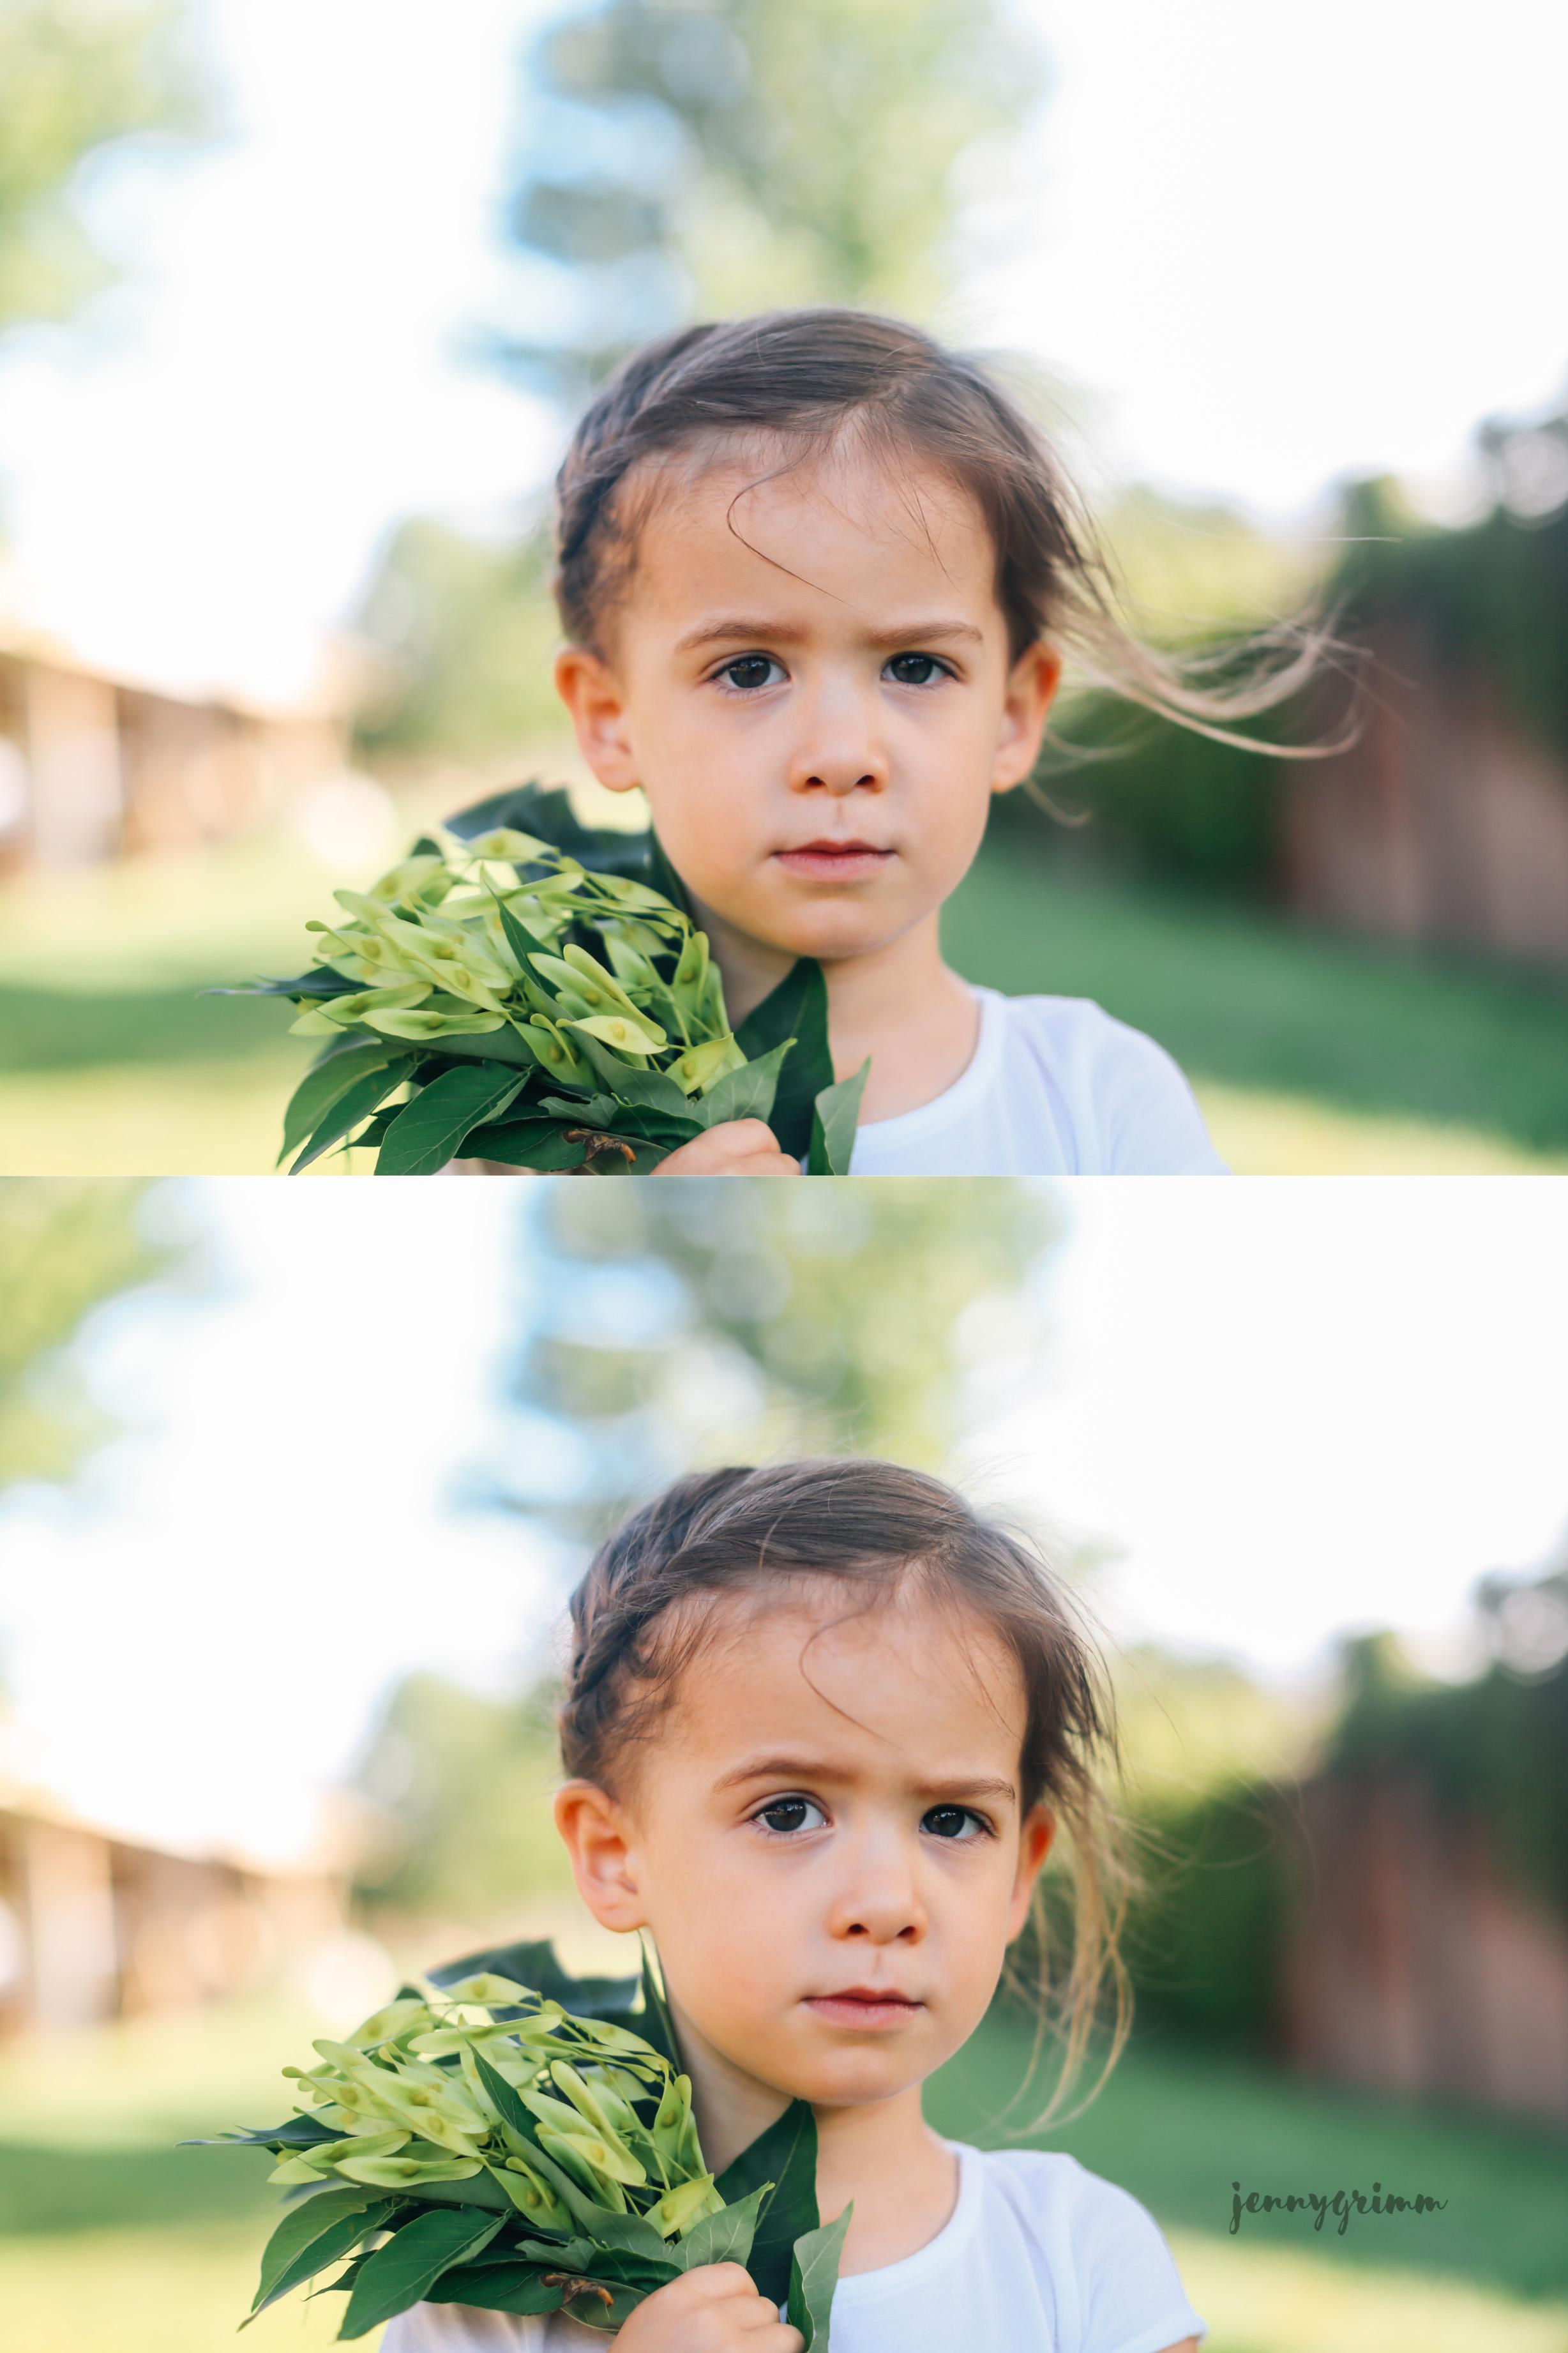 chicago child photographer jenny grimm